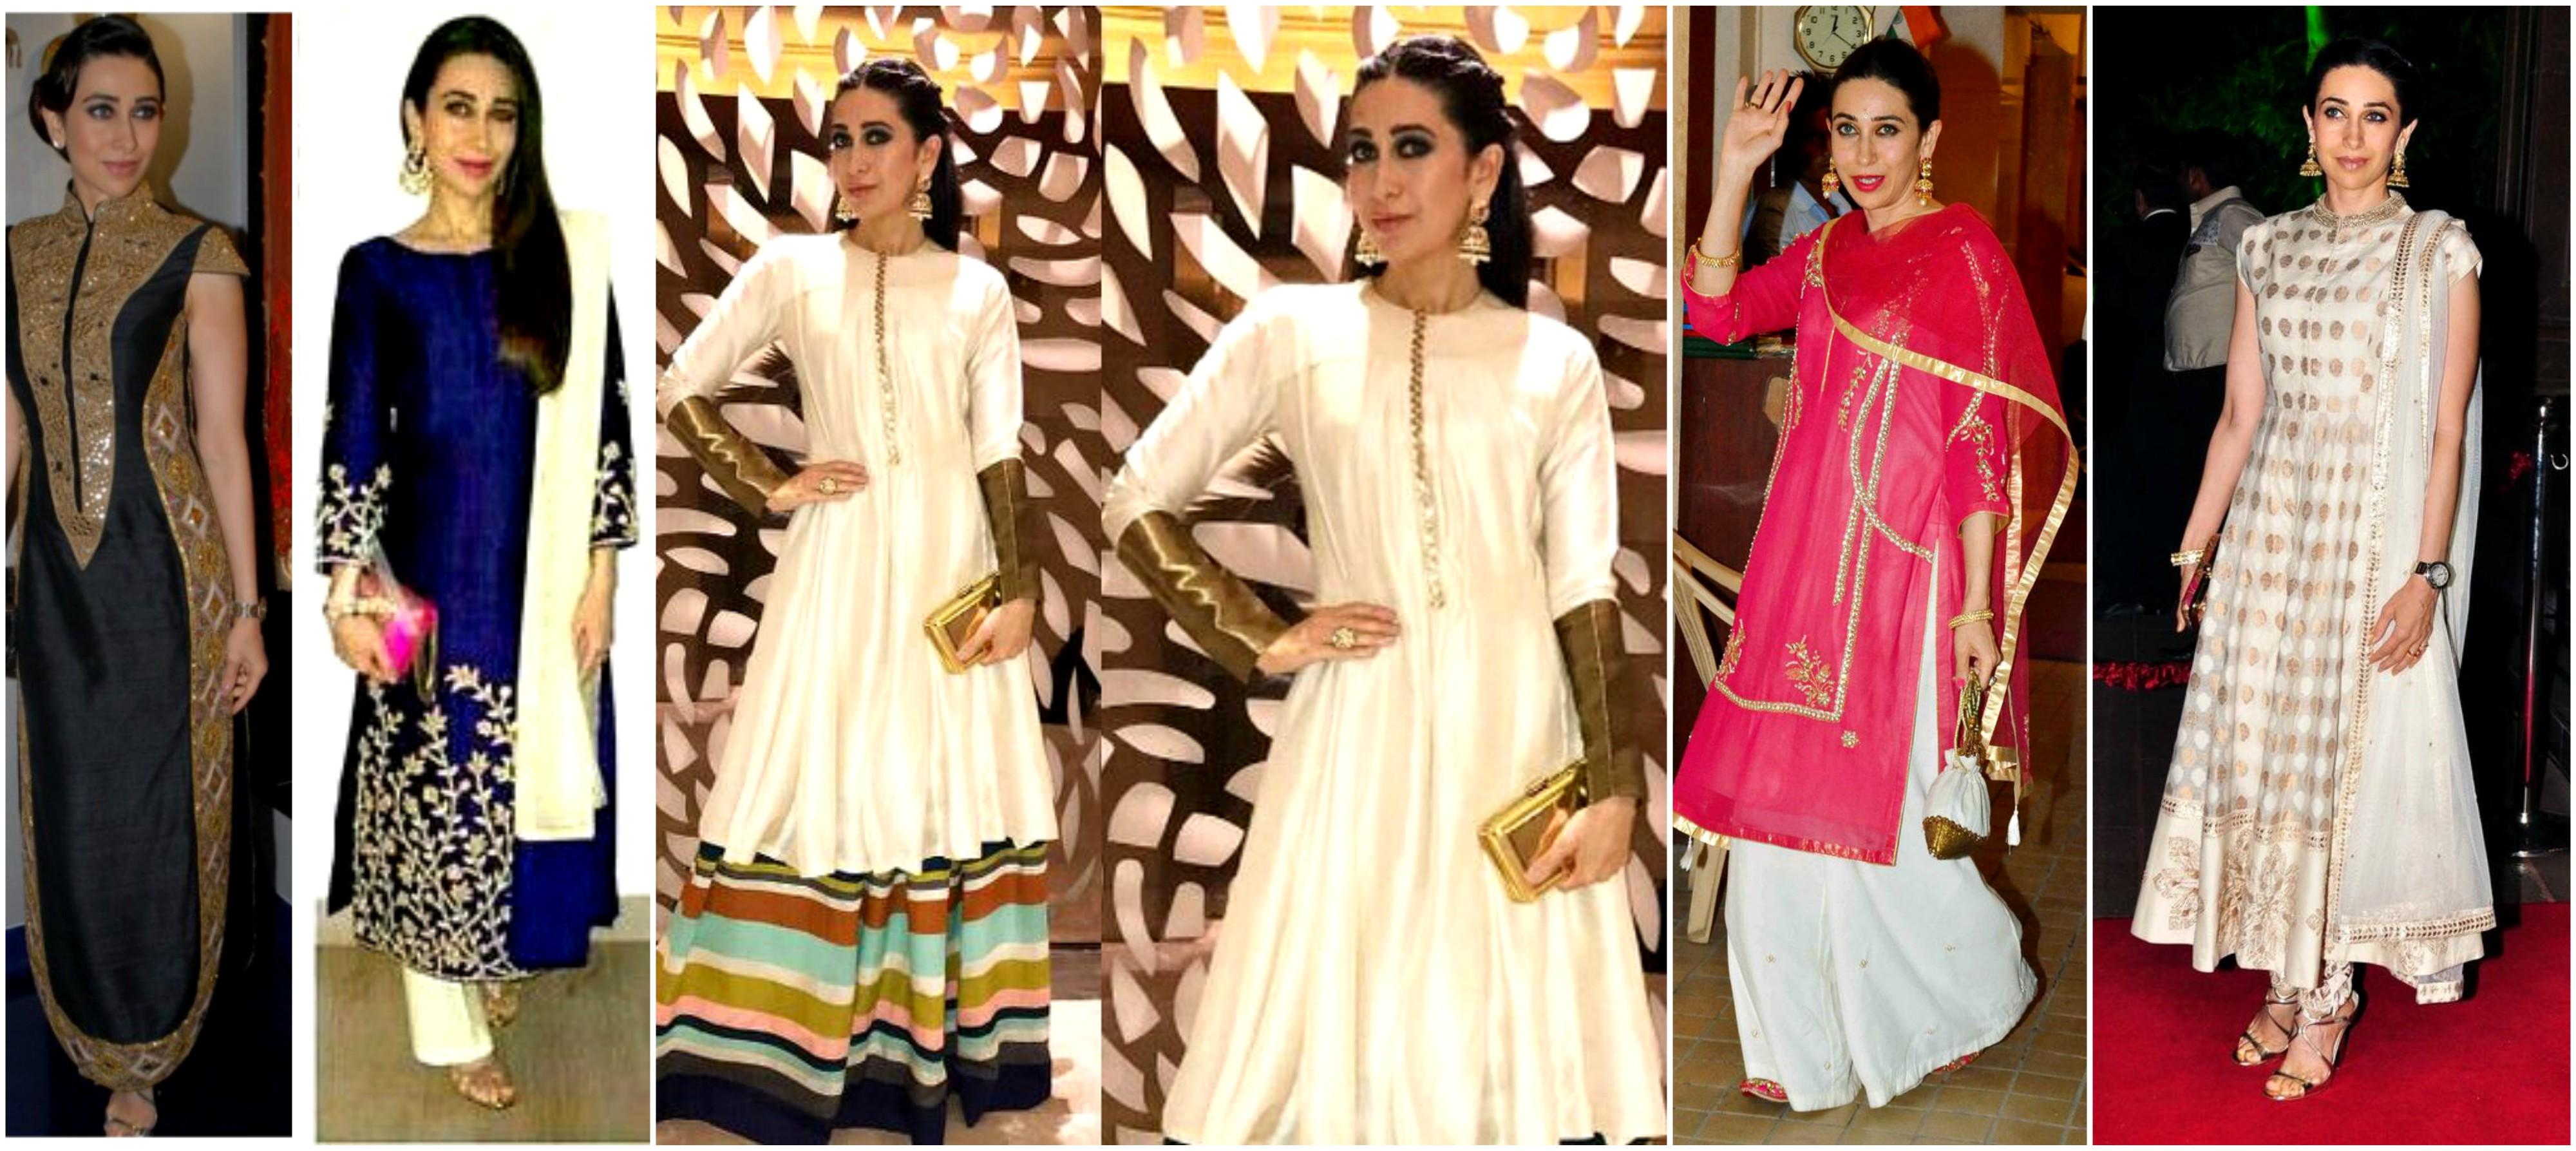 Karishma Kapoor in siljk